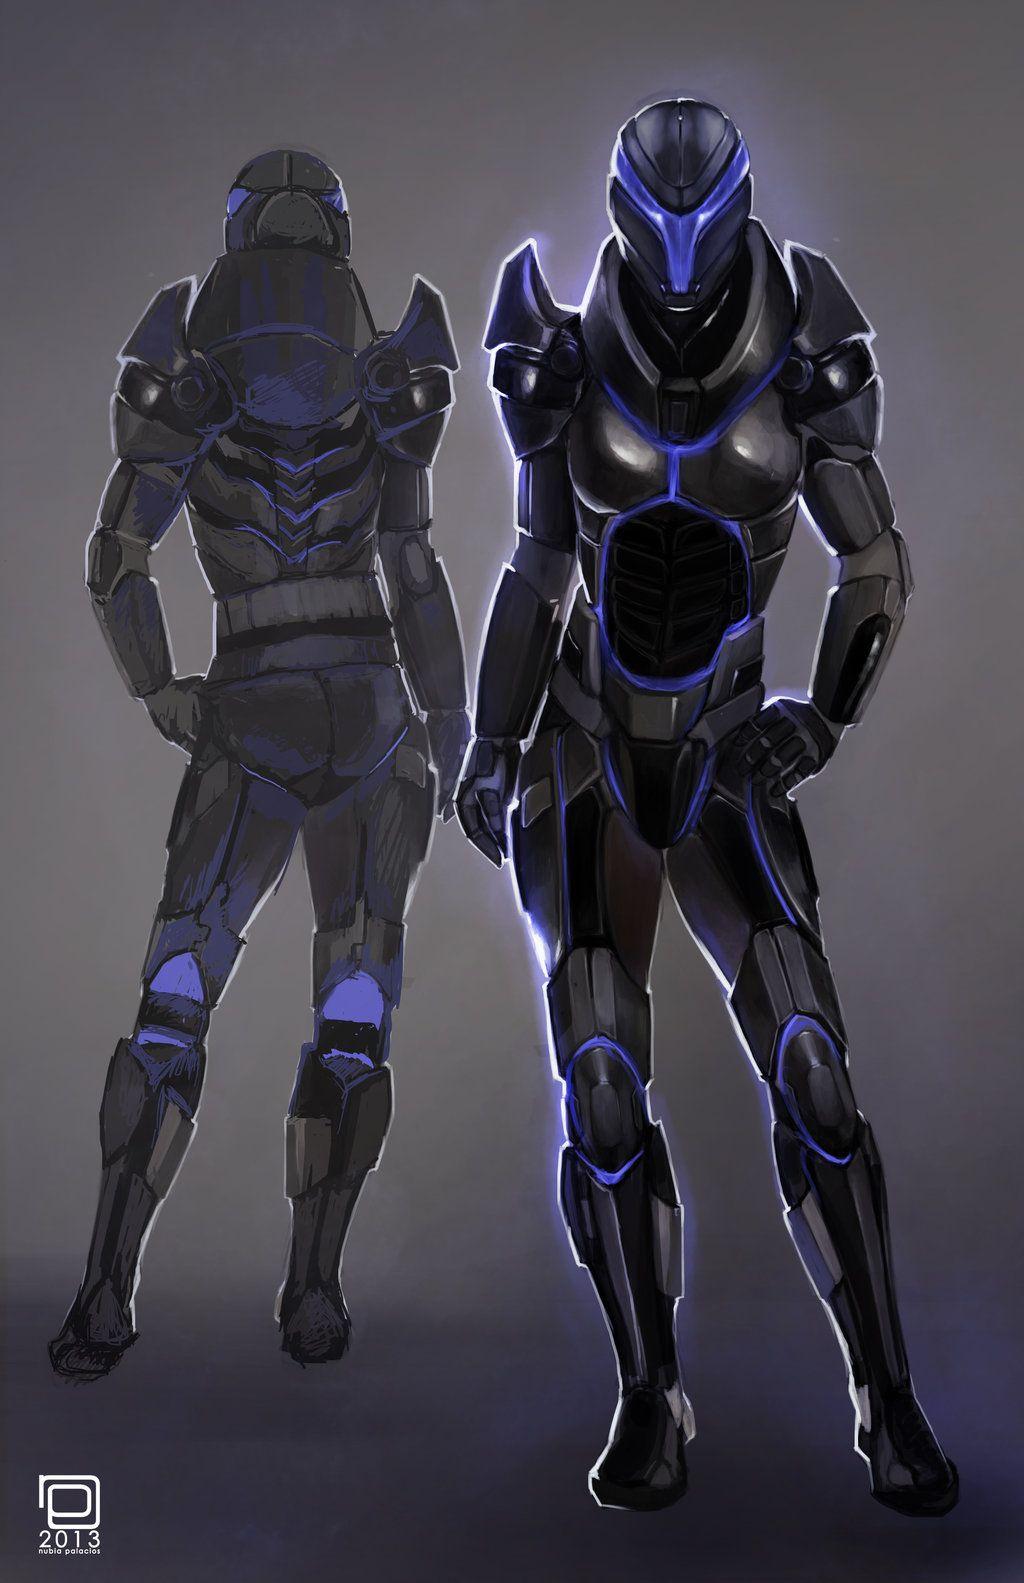 29+ Cyberpunk Futuristic Female Armor Wallpapers